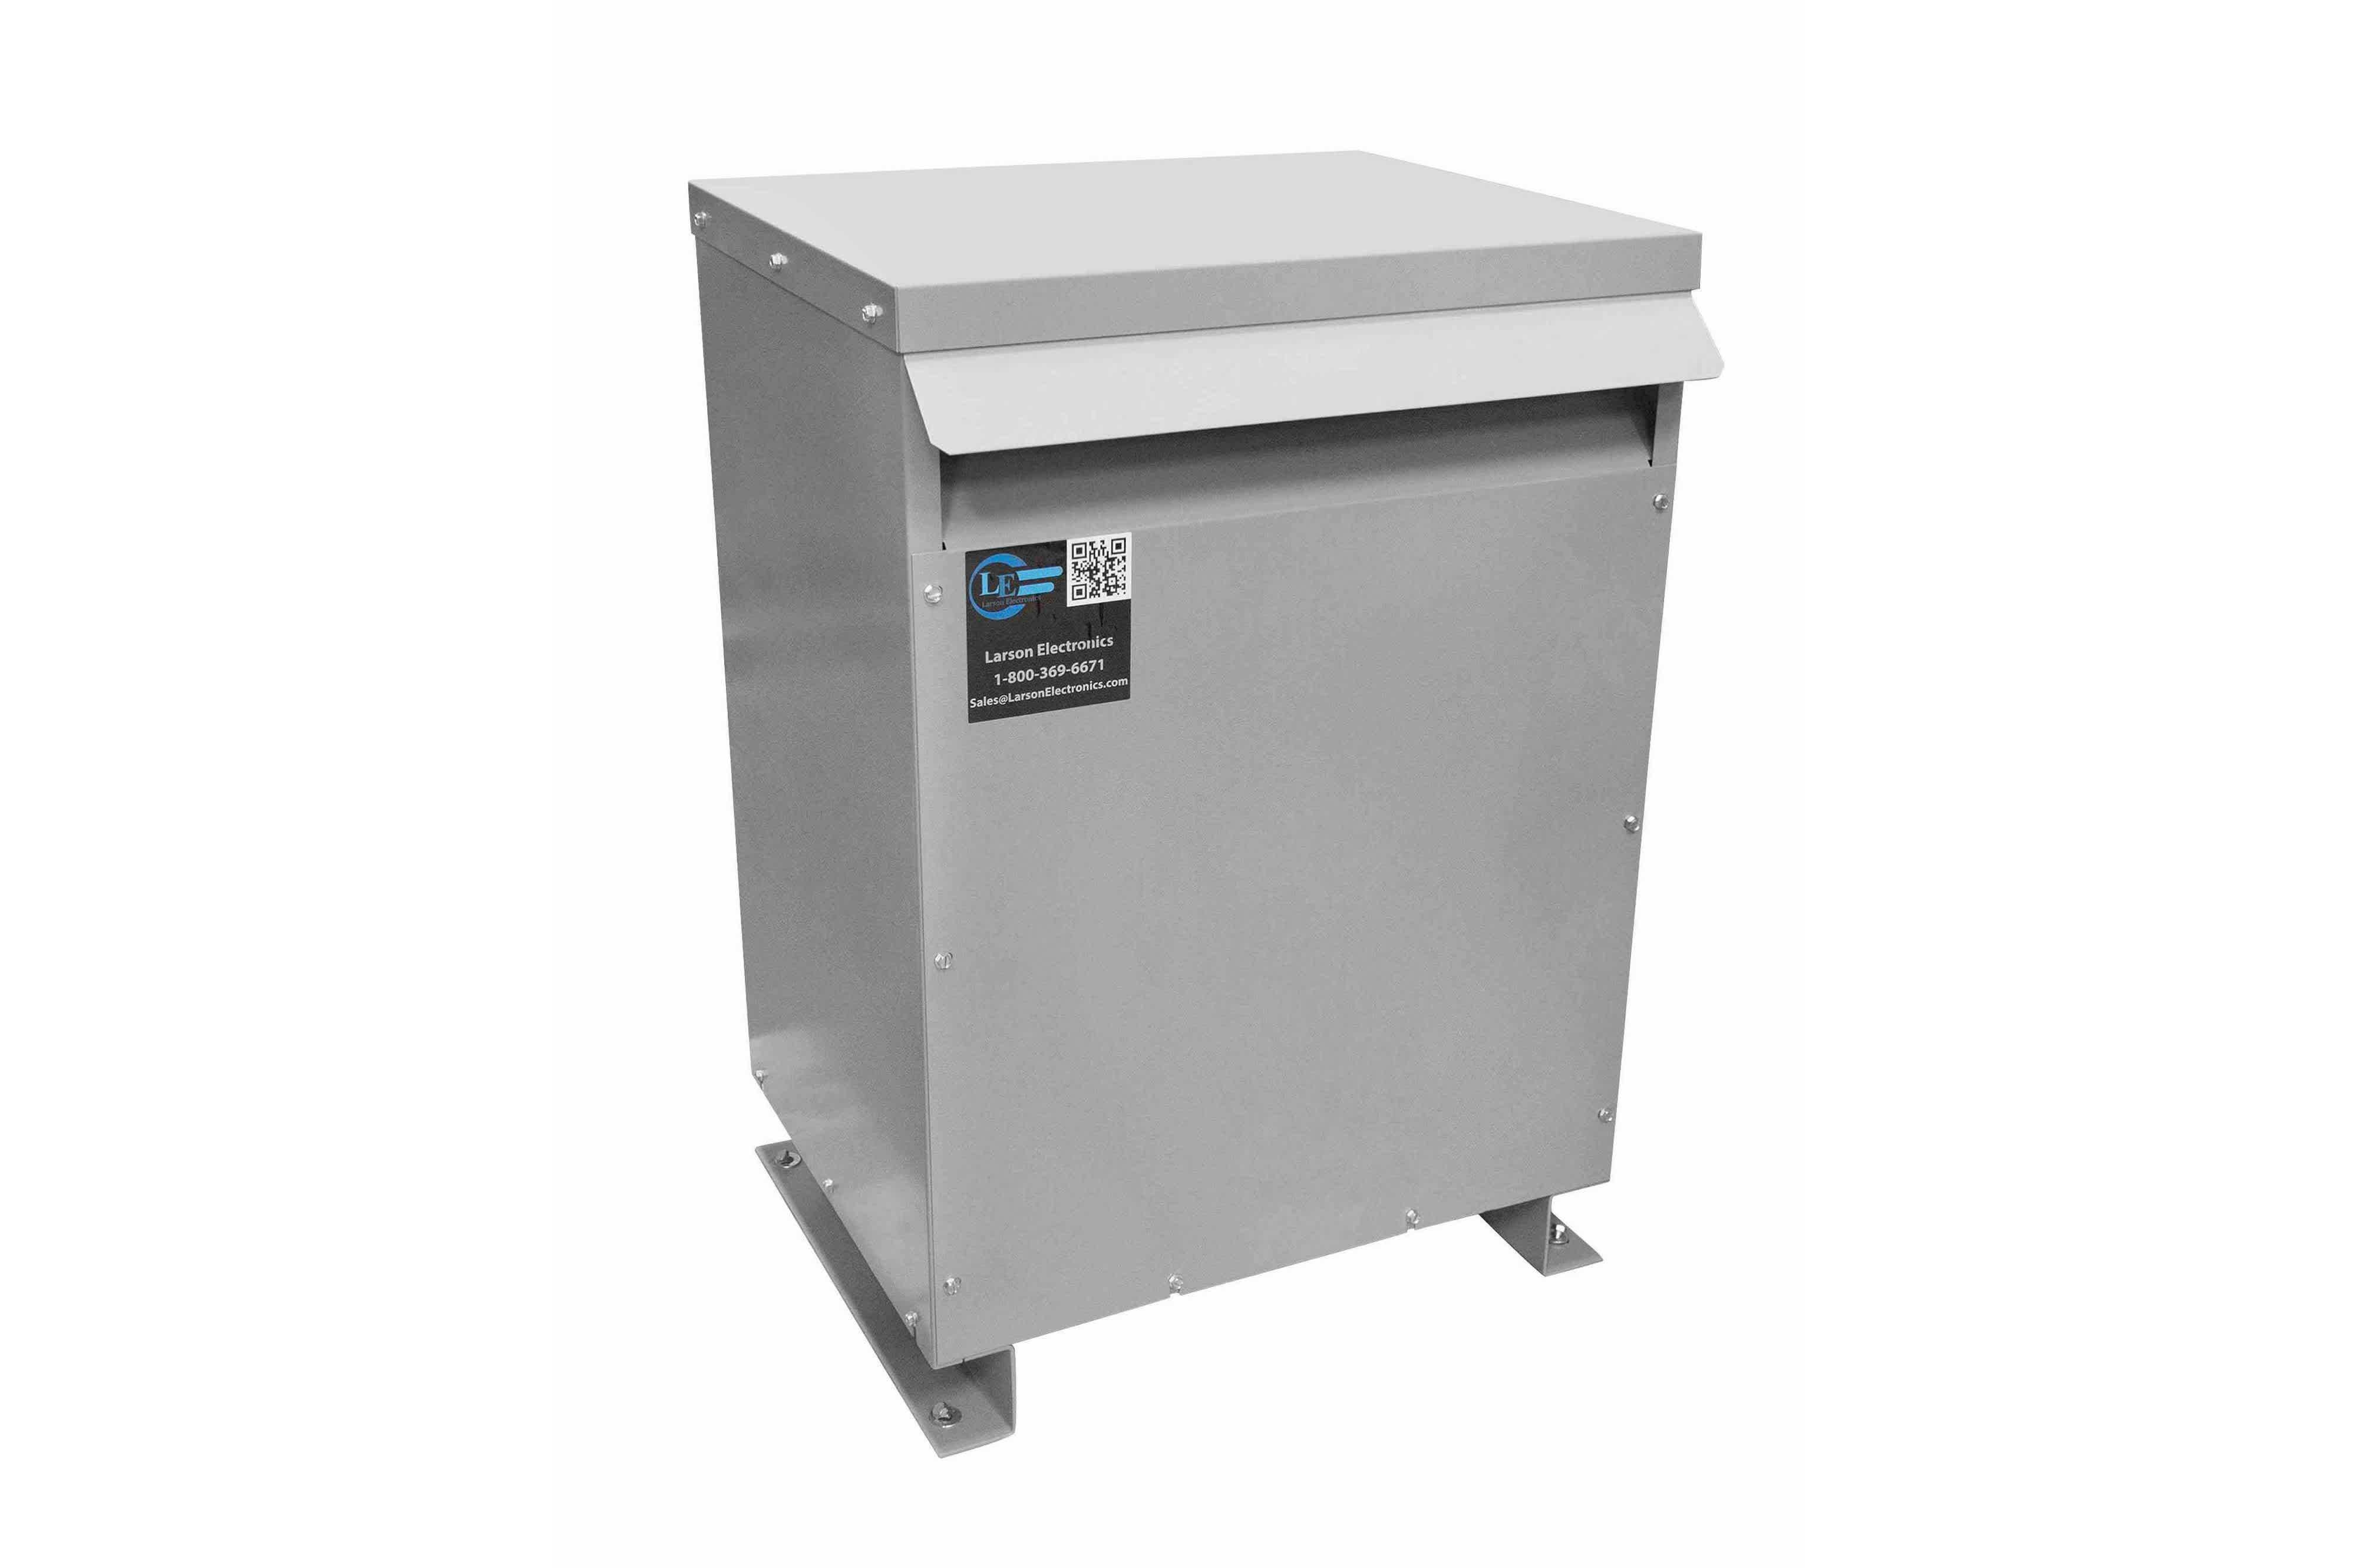 65 kVA 3PH Isolation Transformer, 380V Wye Primary, 240V Delta Secondary, N3R, Ventilated, 60 Hz